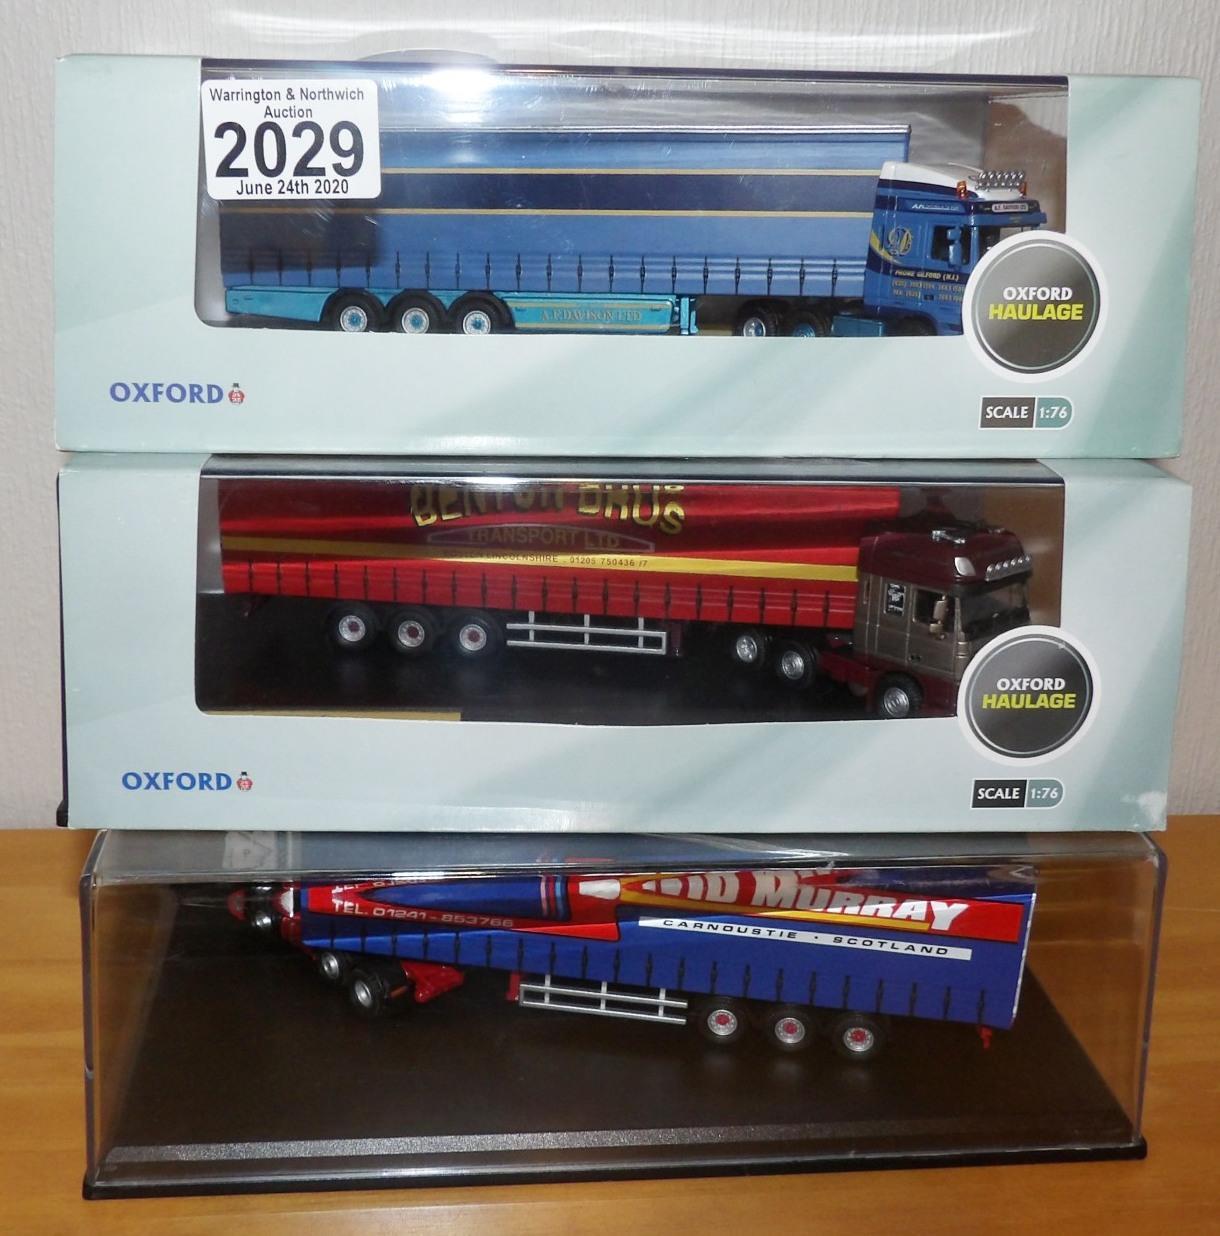 Lot 2029 - Oxford x 3 1.76 Scale David Murray, Benton Bros, AF Davison, all Ltd Editions. P&P Group 2 (£18+